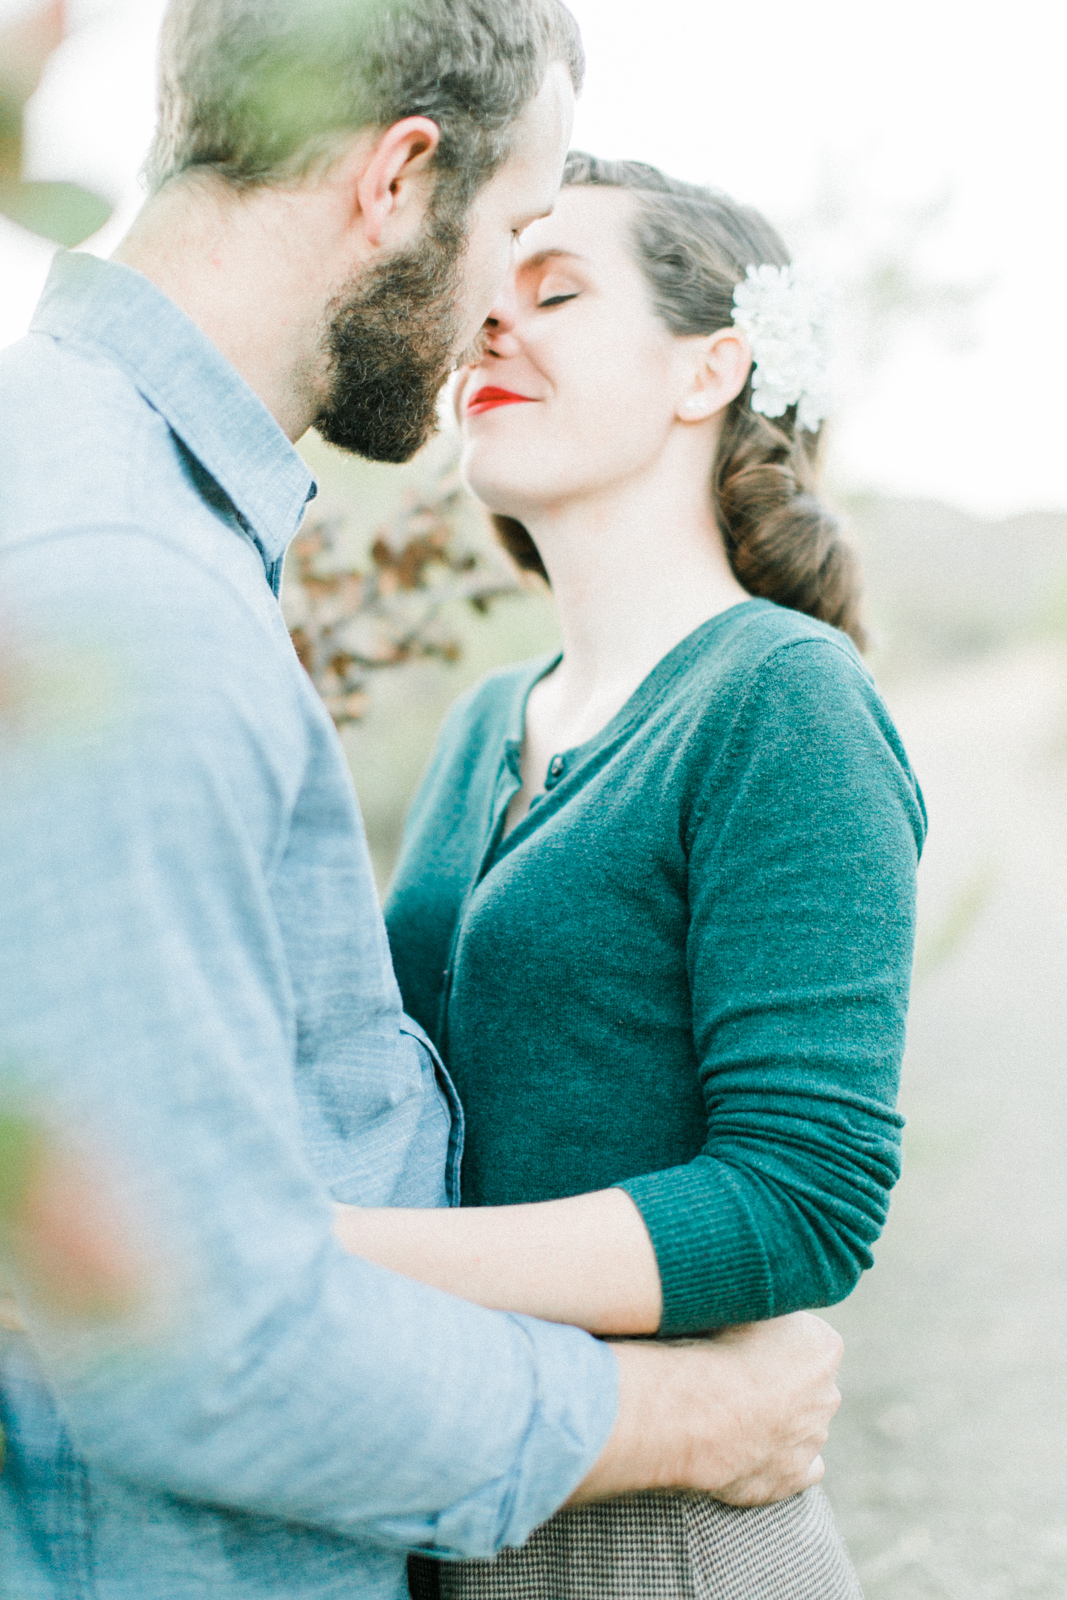 boise-idaho-wedding-elopement-photographer-2688.jpg